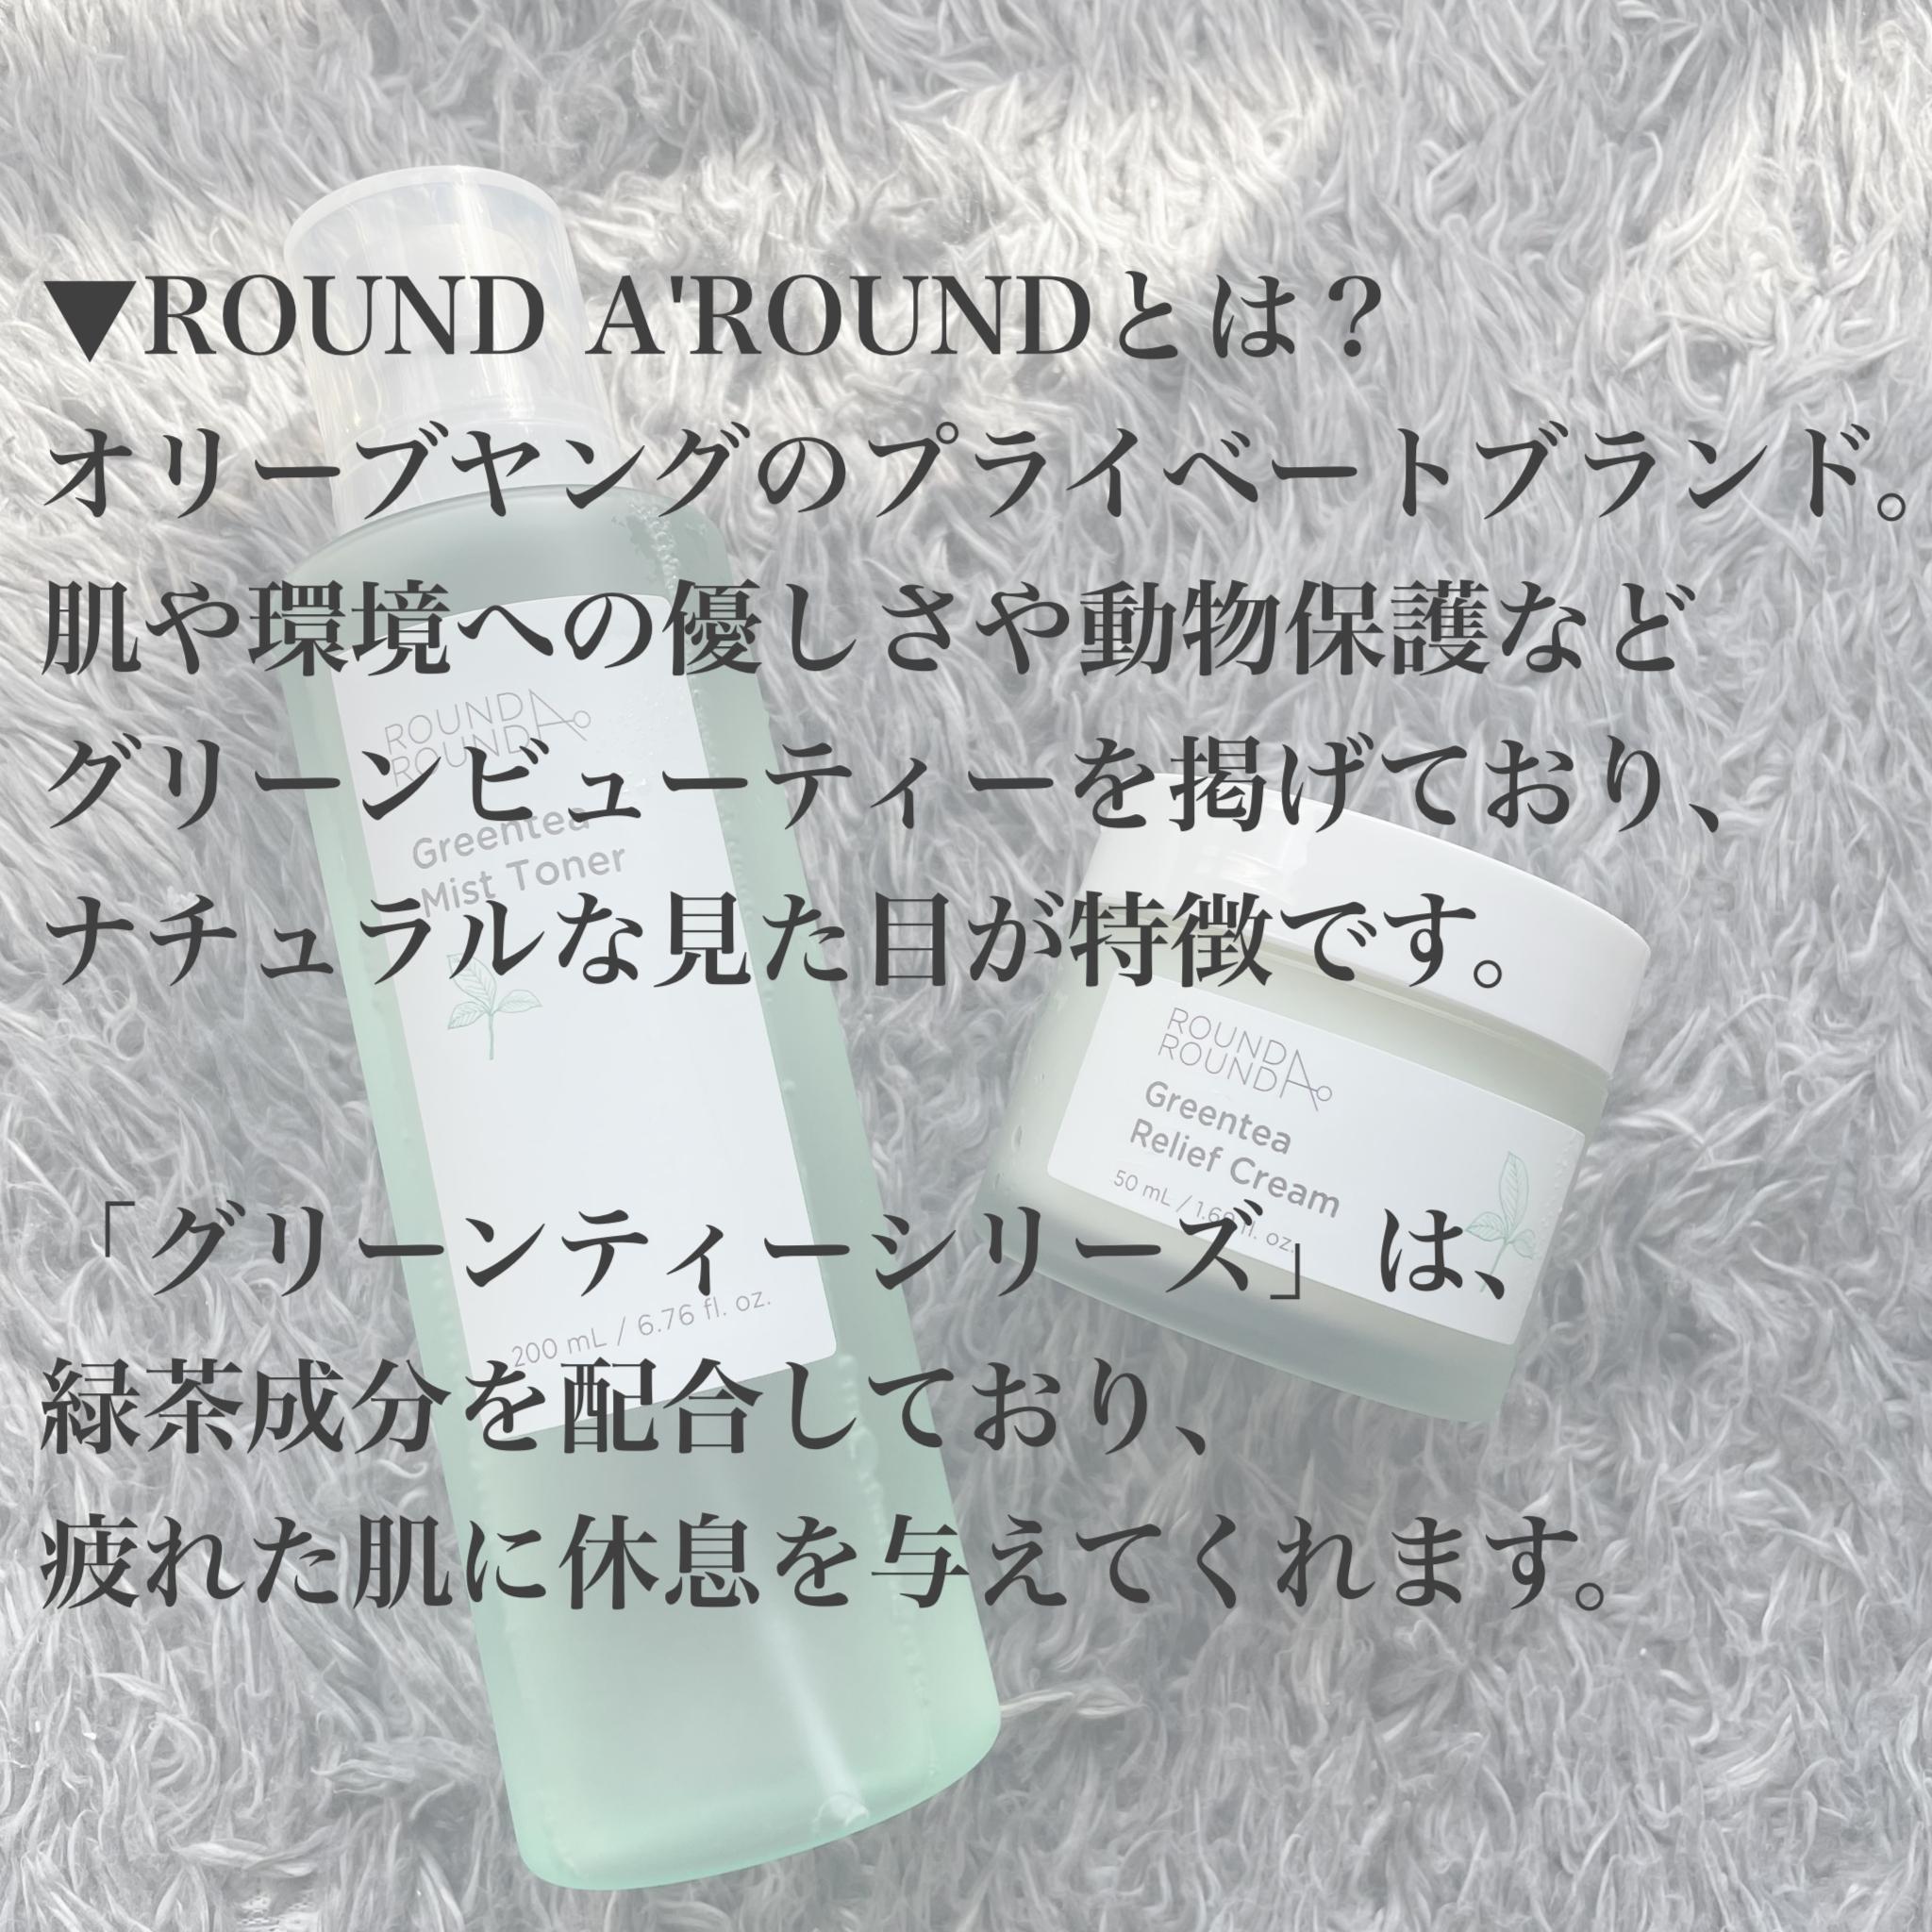 ROUNDAROUND(ラウンドアラウンド) グリーンティ リリーフクリームの良い点・メリットに関するけいさんの口コミ画像2